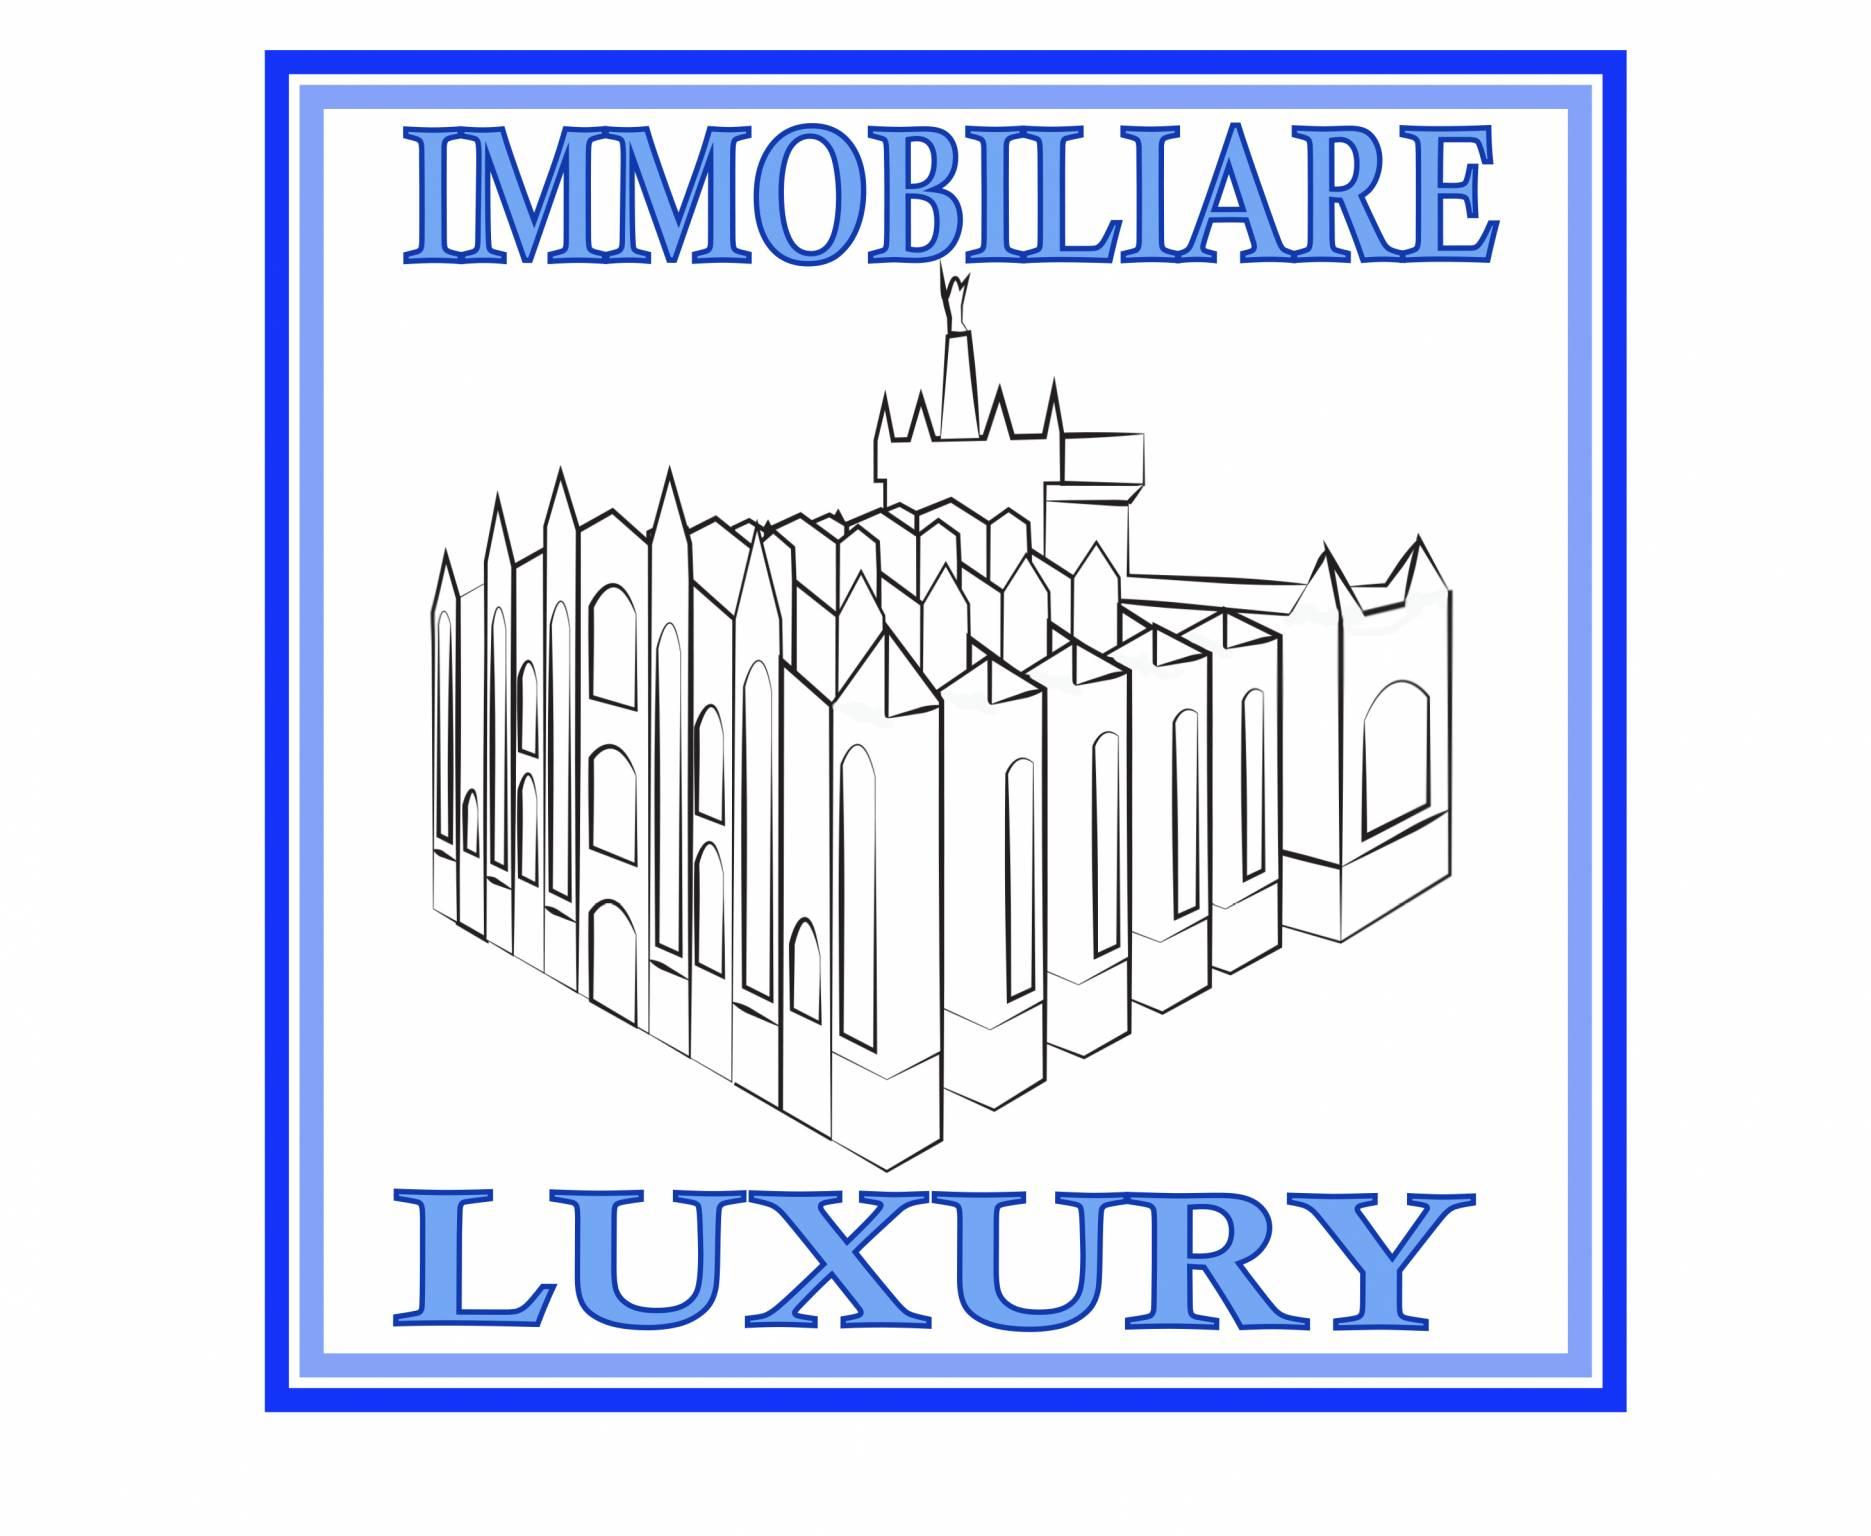 Immobiliare luxury srl